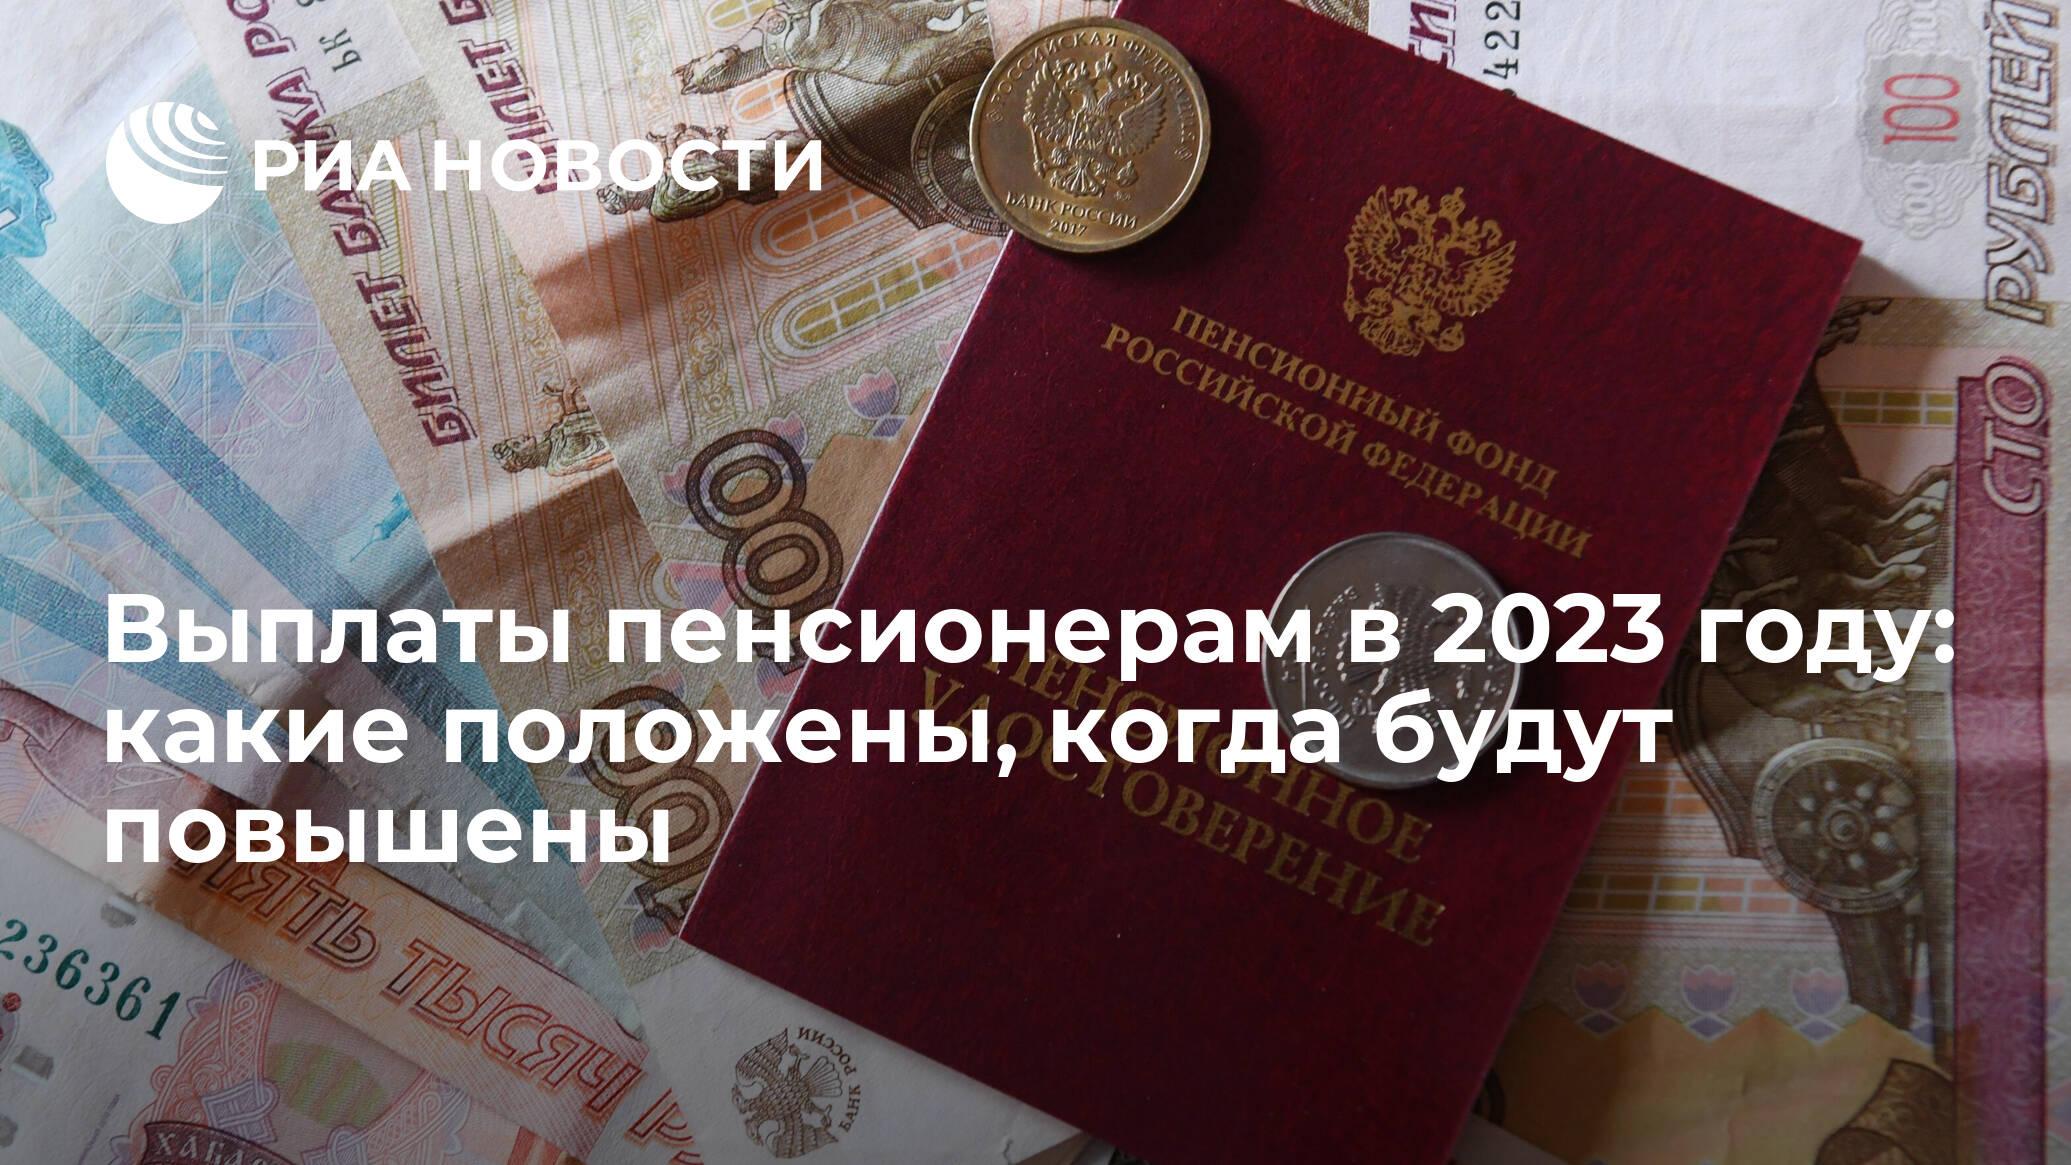 https://cdn23.img.ria.ru/images/sharing/article/1733797173.jpg?15249306411621962832